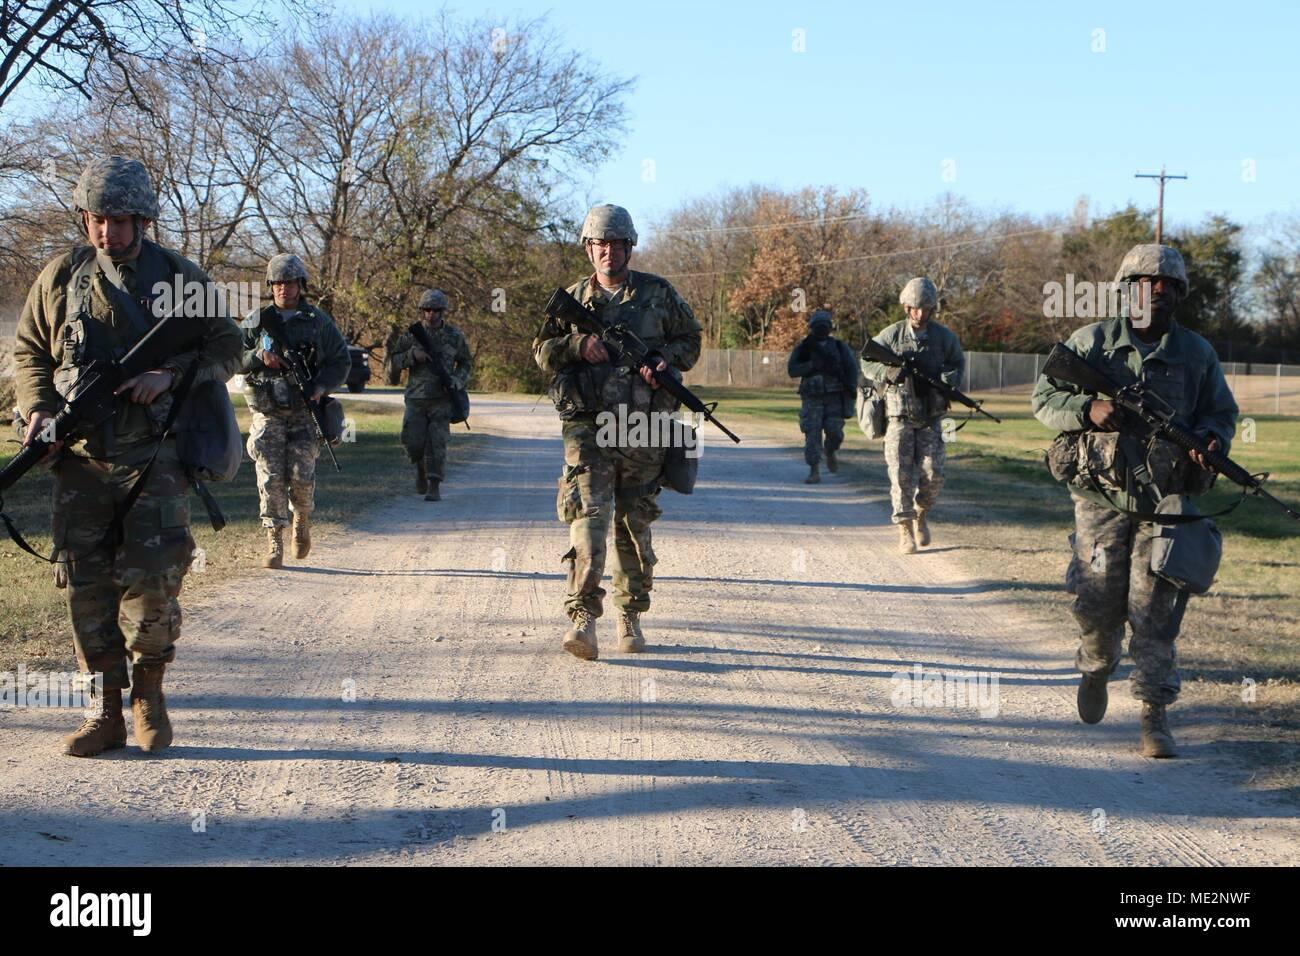 Fantastisch Armee Reserve Lebenslauf Fotos - Entry Level Resume ...